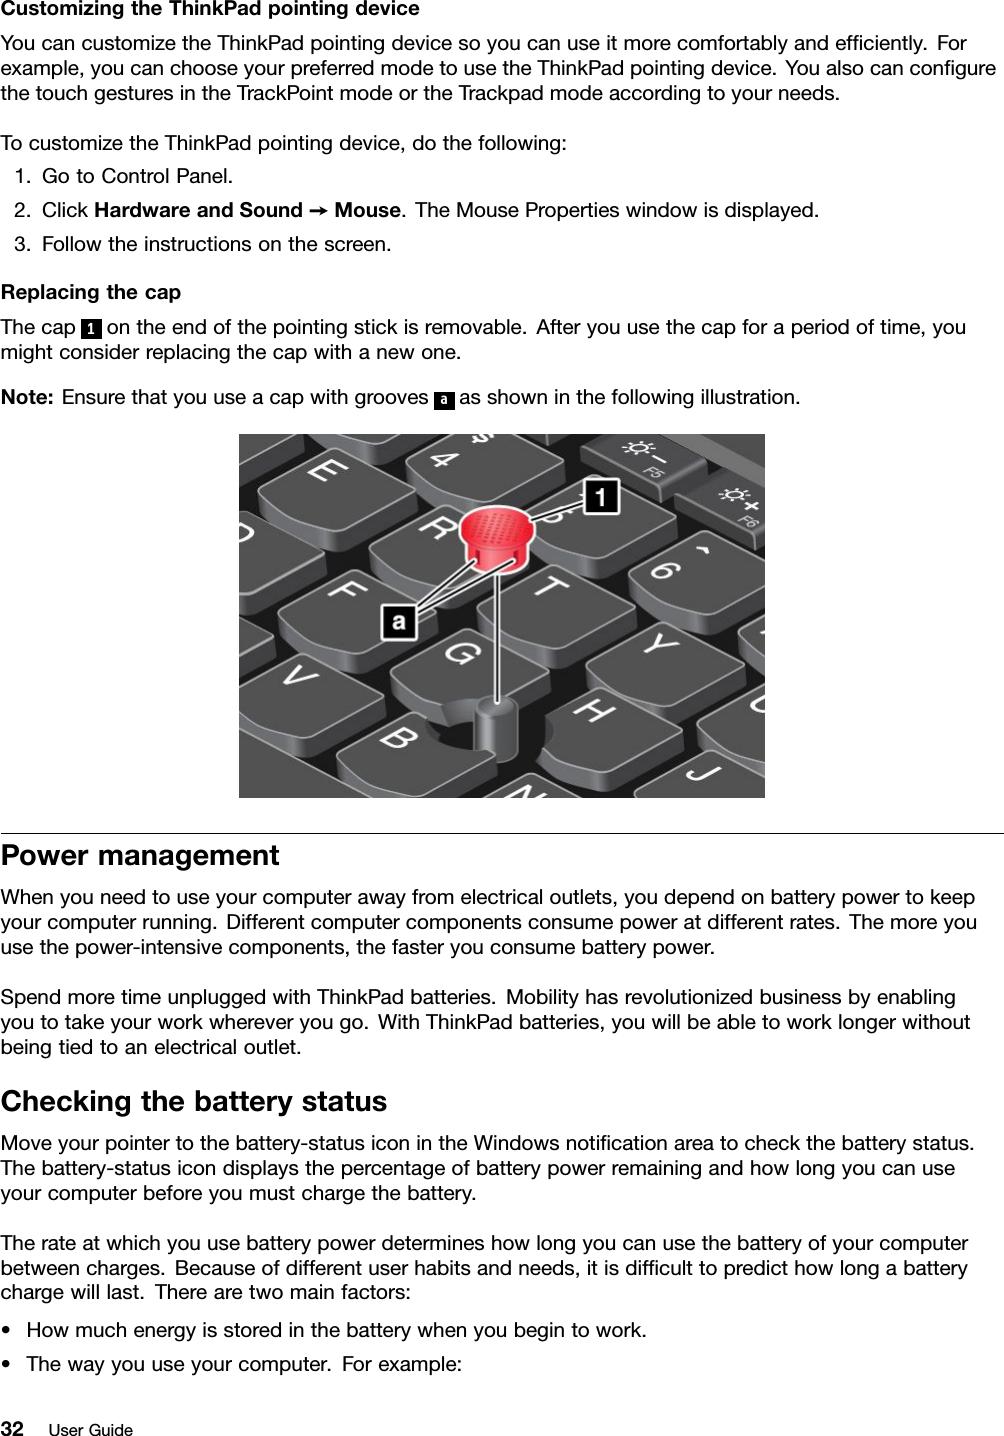 Lenovo L440 L540 Ug En (English) User Guide ThinkPad And